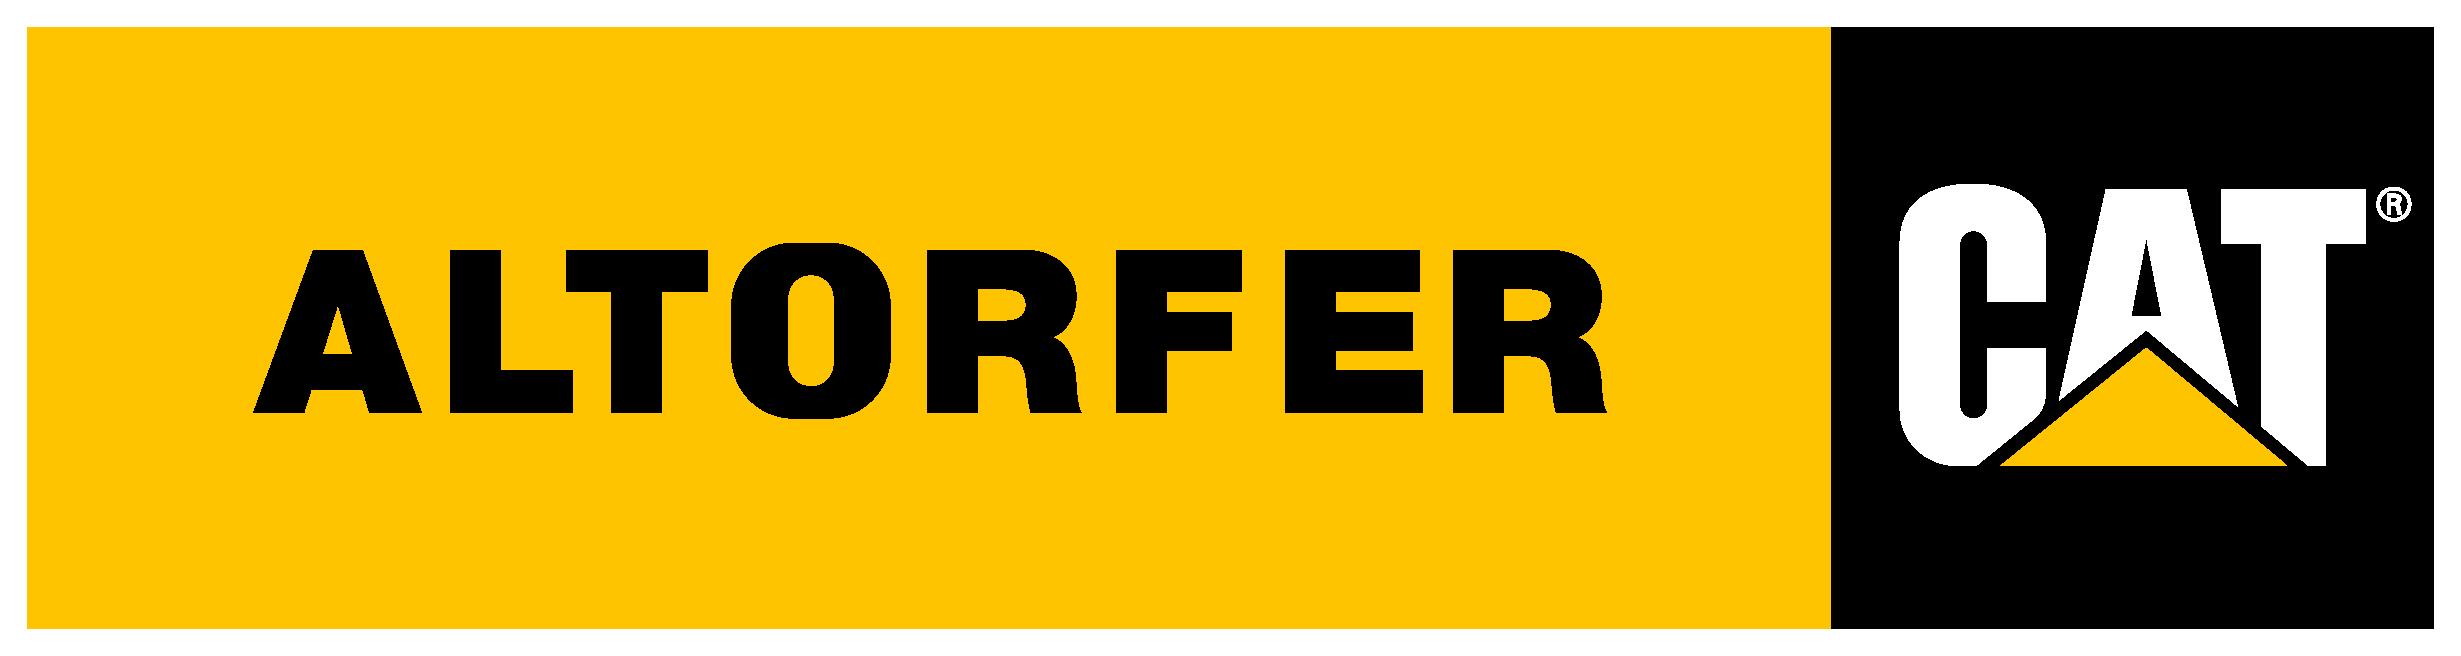 Altorfer Holdings company logo